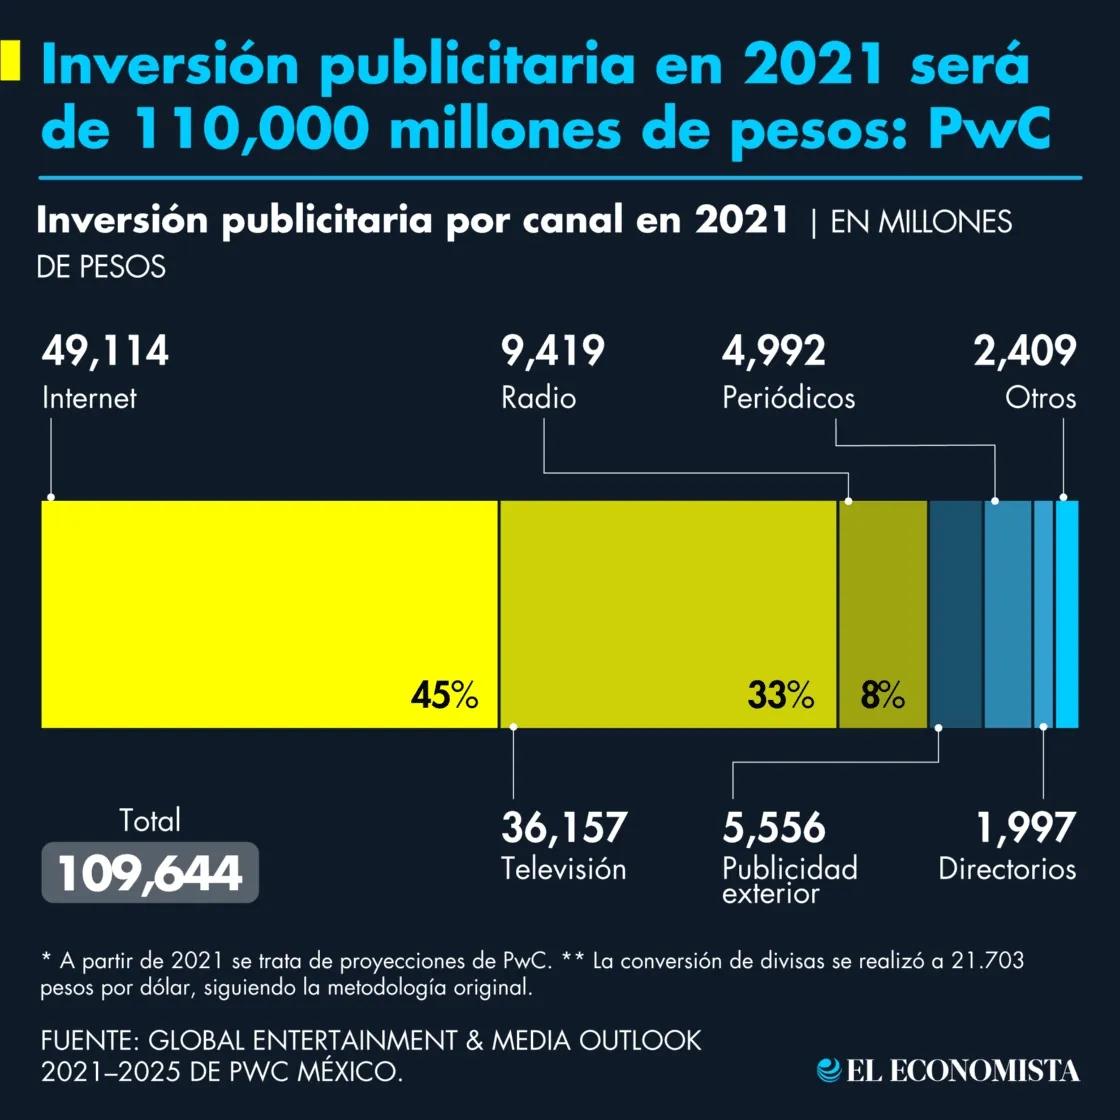 pwc_inversion_publicitaria_2021.png_990121245.png